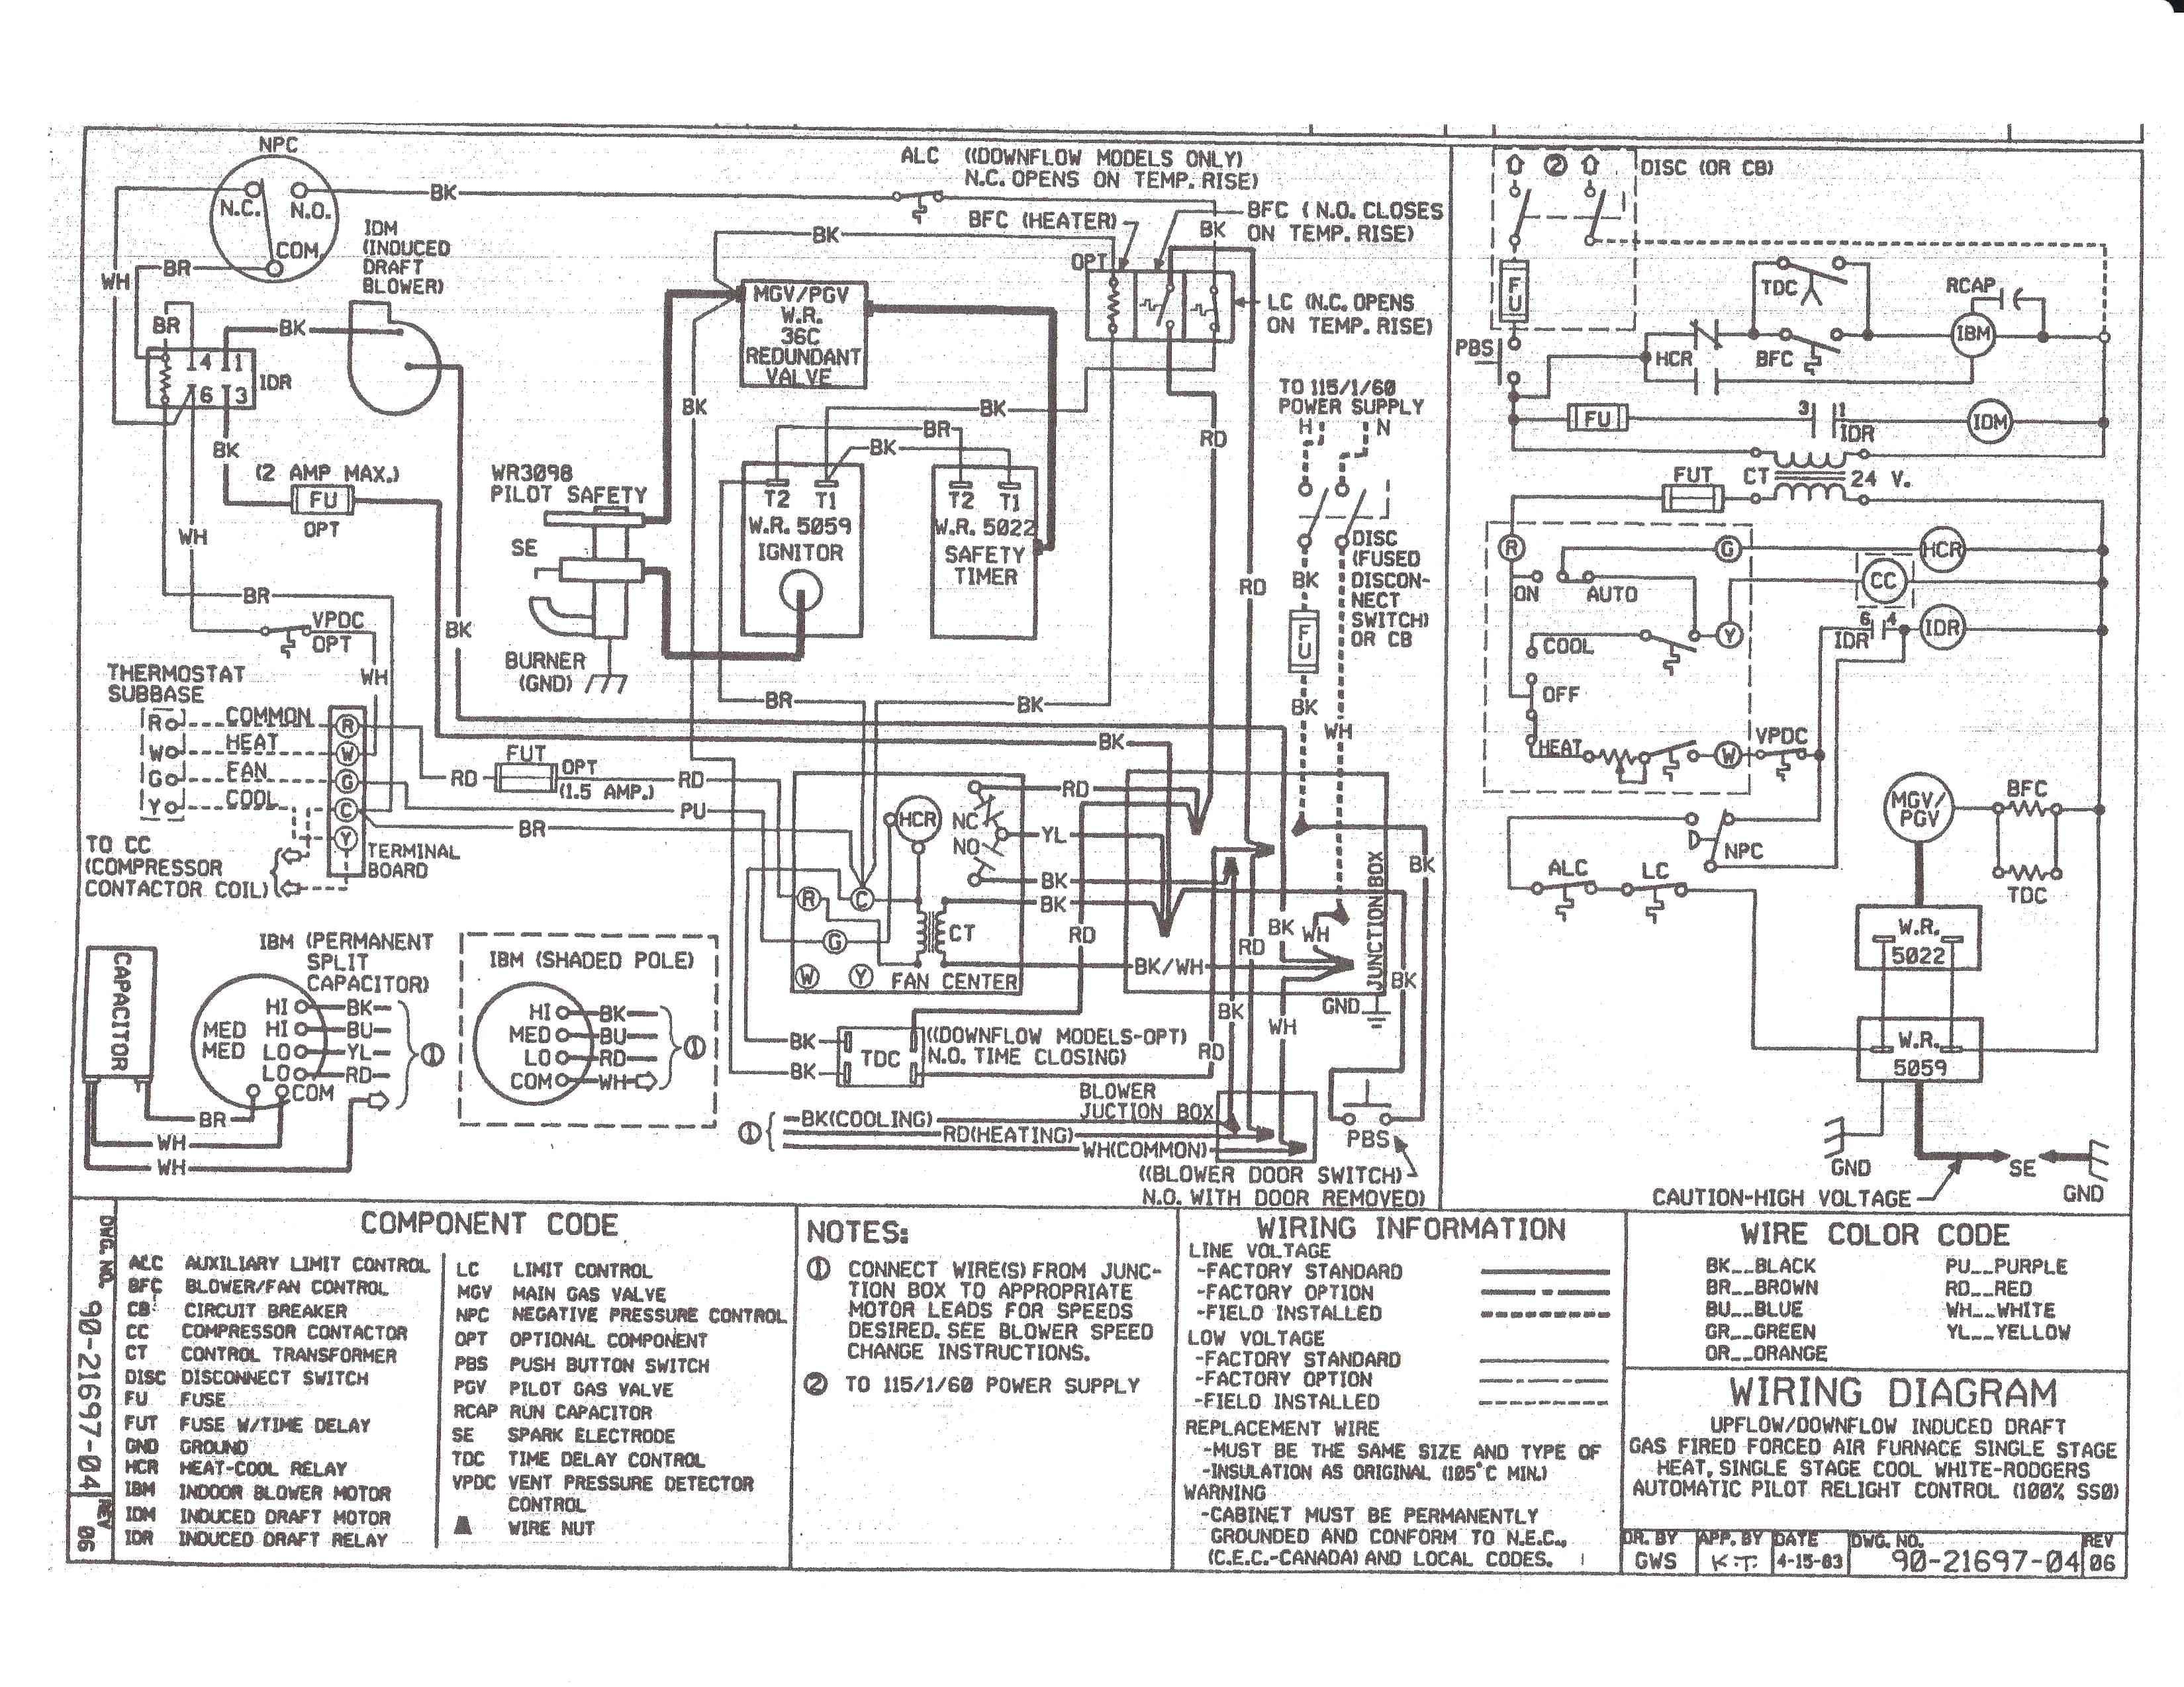 york furnace wiring diagram Download-coleman furnace wiring diagram furthermore york furnace wiring rh koloewrty co york electric furnace wiring diagram 11-e